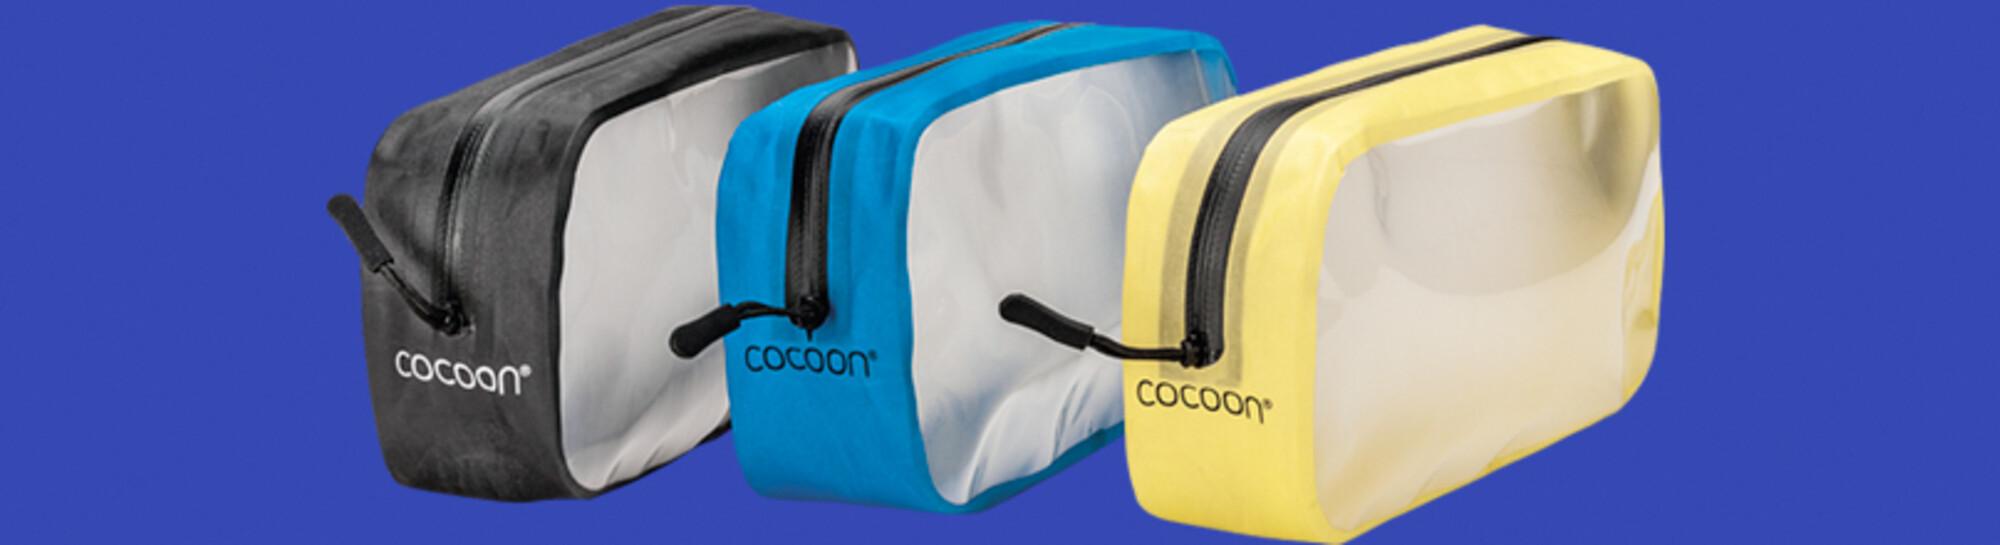 Carry-on Liquids Bags